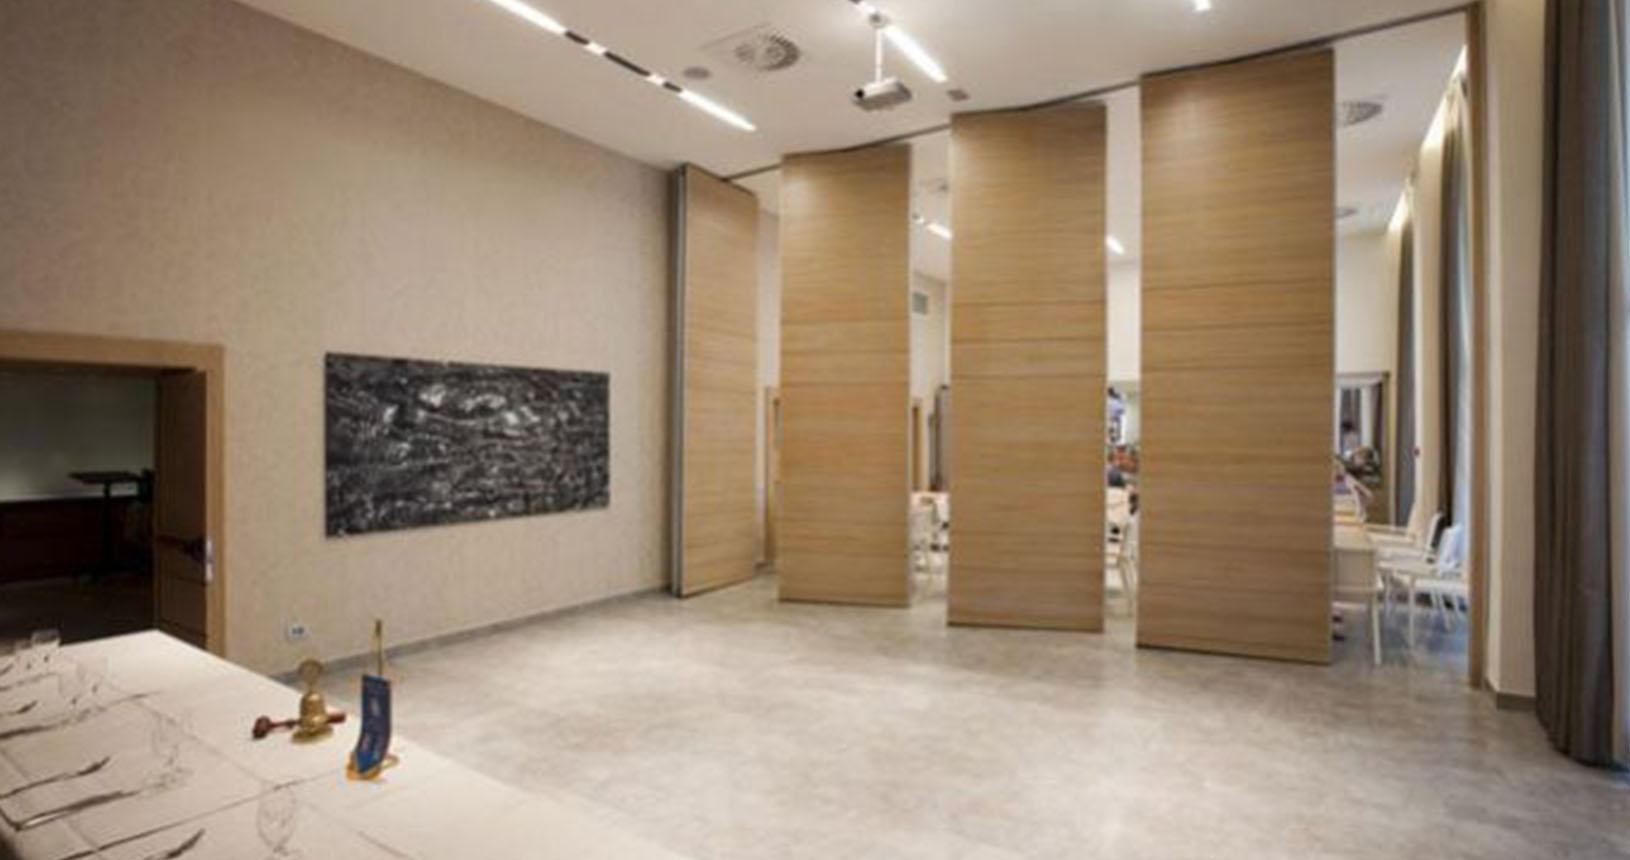 Pannelli fonoassorbenti pareti manovrabili cagliari e sardegna - Pannelli fonoassorbenti decorativi ...